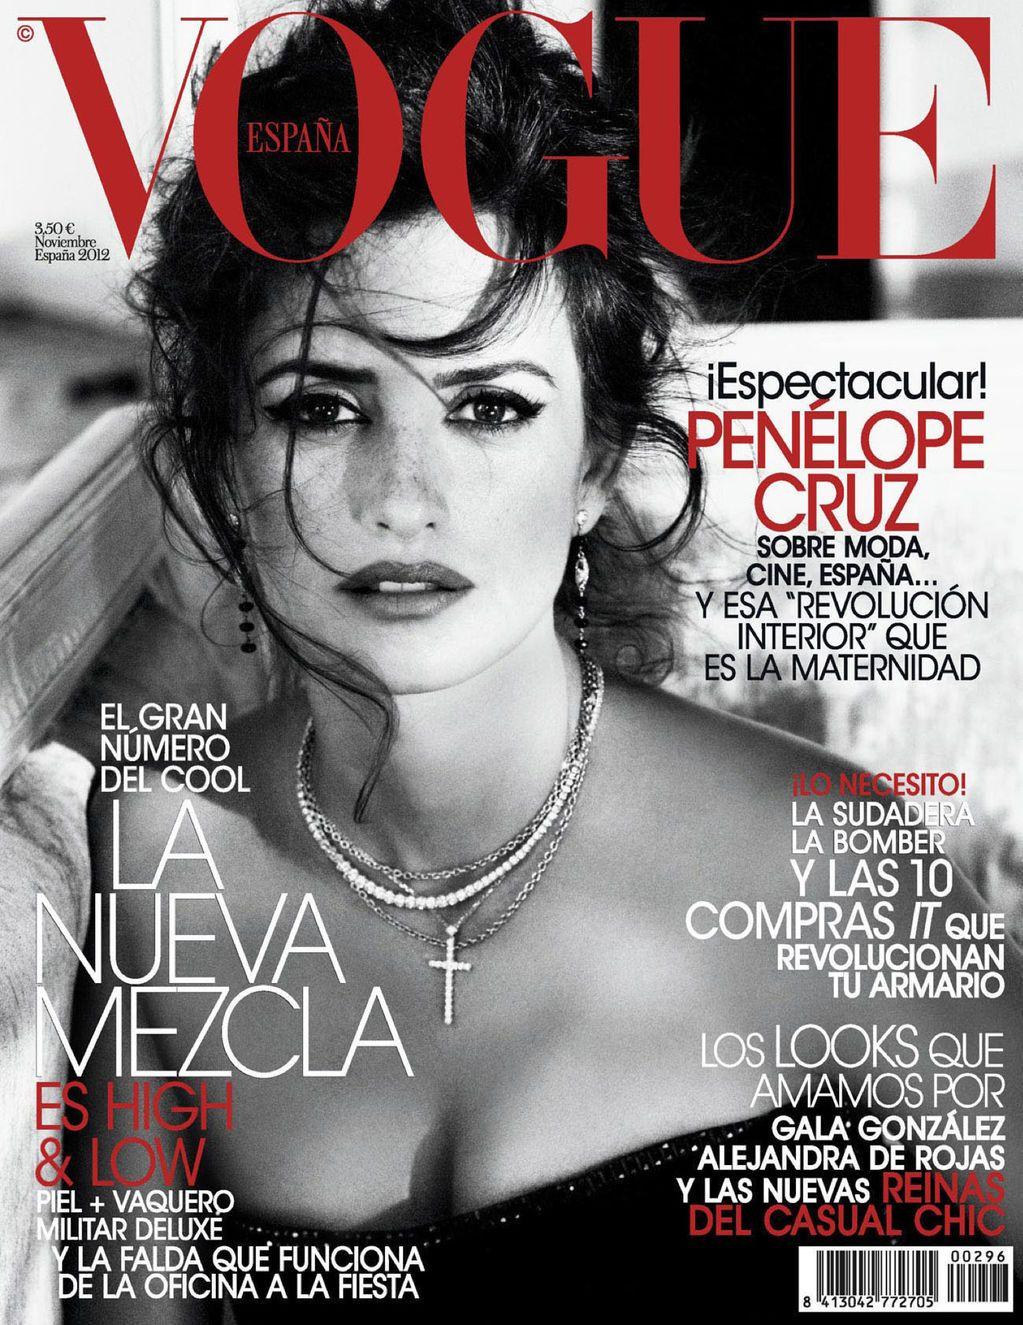 Penelope-Cruz-in-Vogue-Spain-November-2012-1